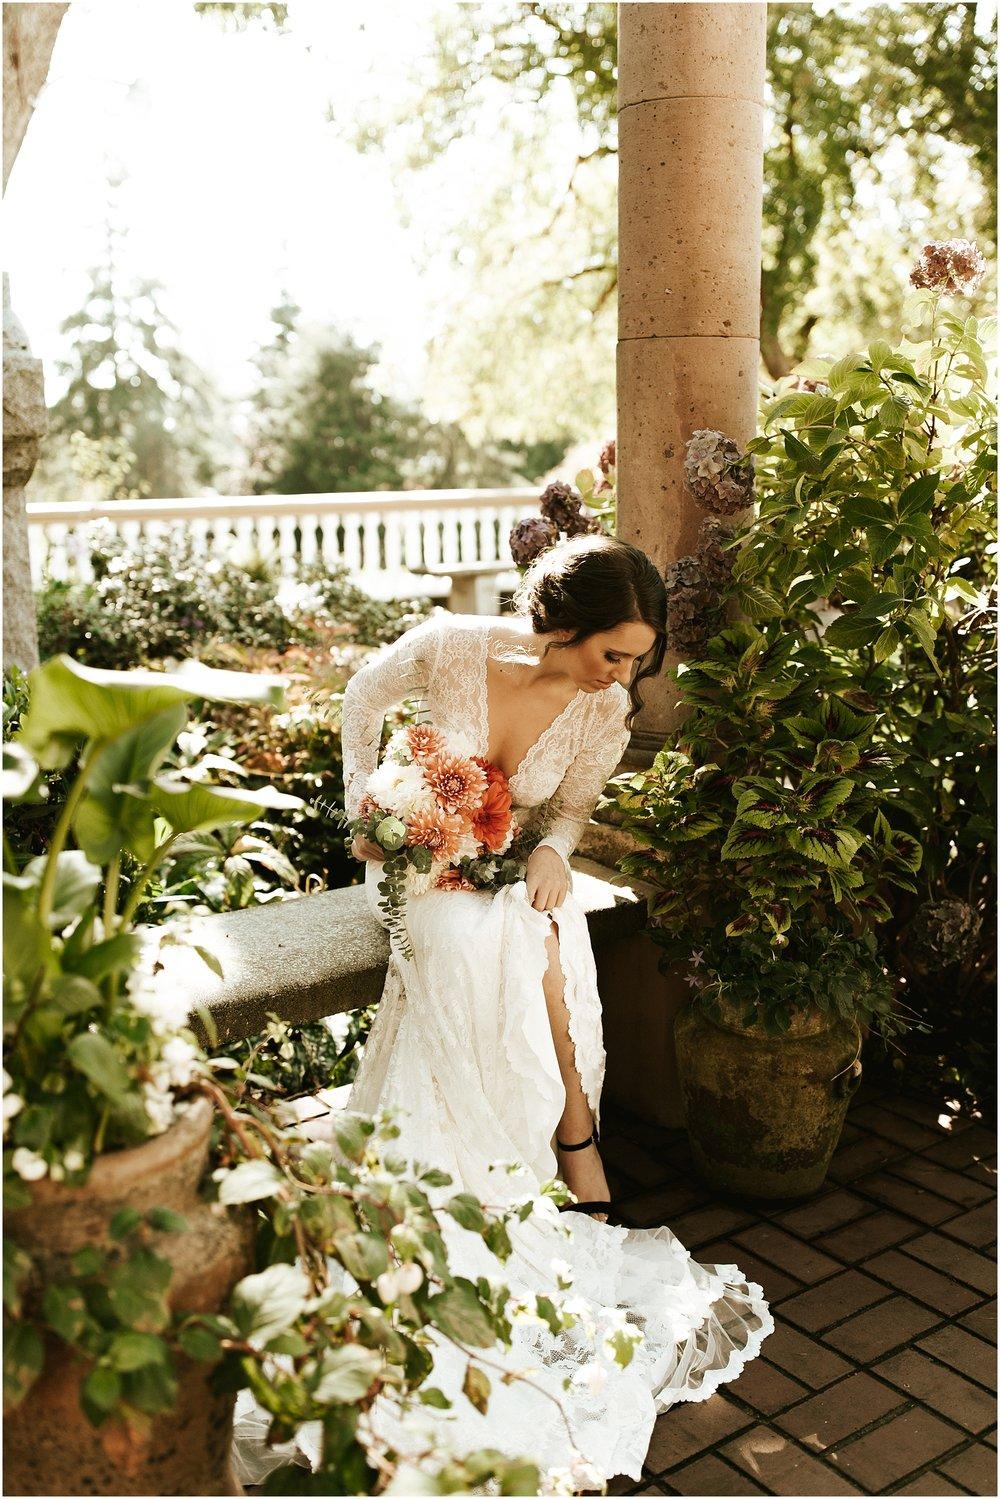 Lairmont Manor Wedding Bellingham Cassie Trottier Photo1016.jpg